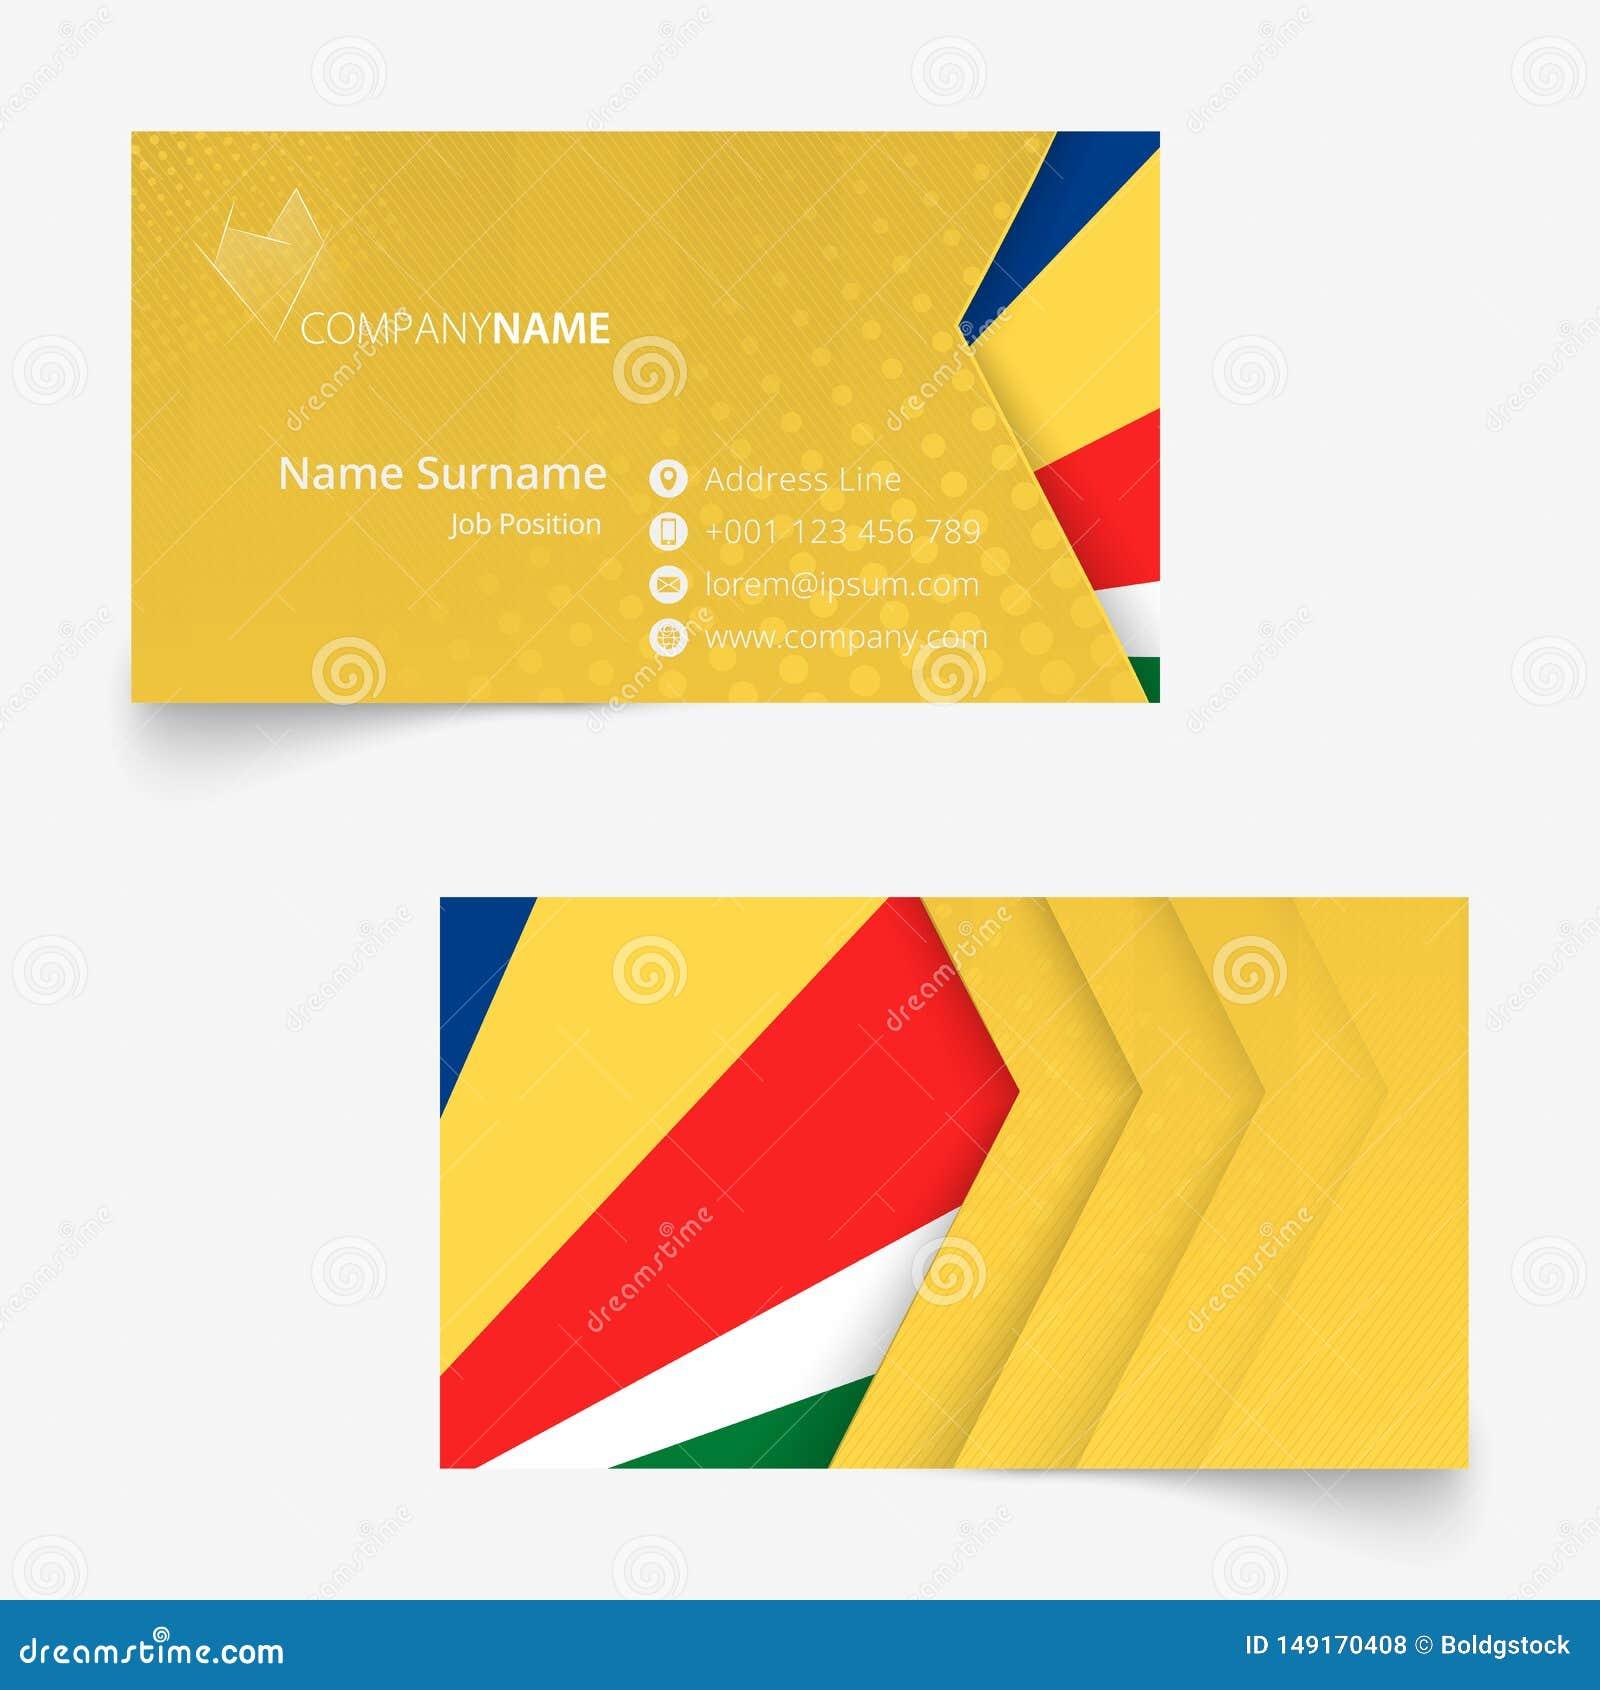 seychelles flag business card standard size 90x50 mm